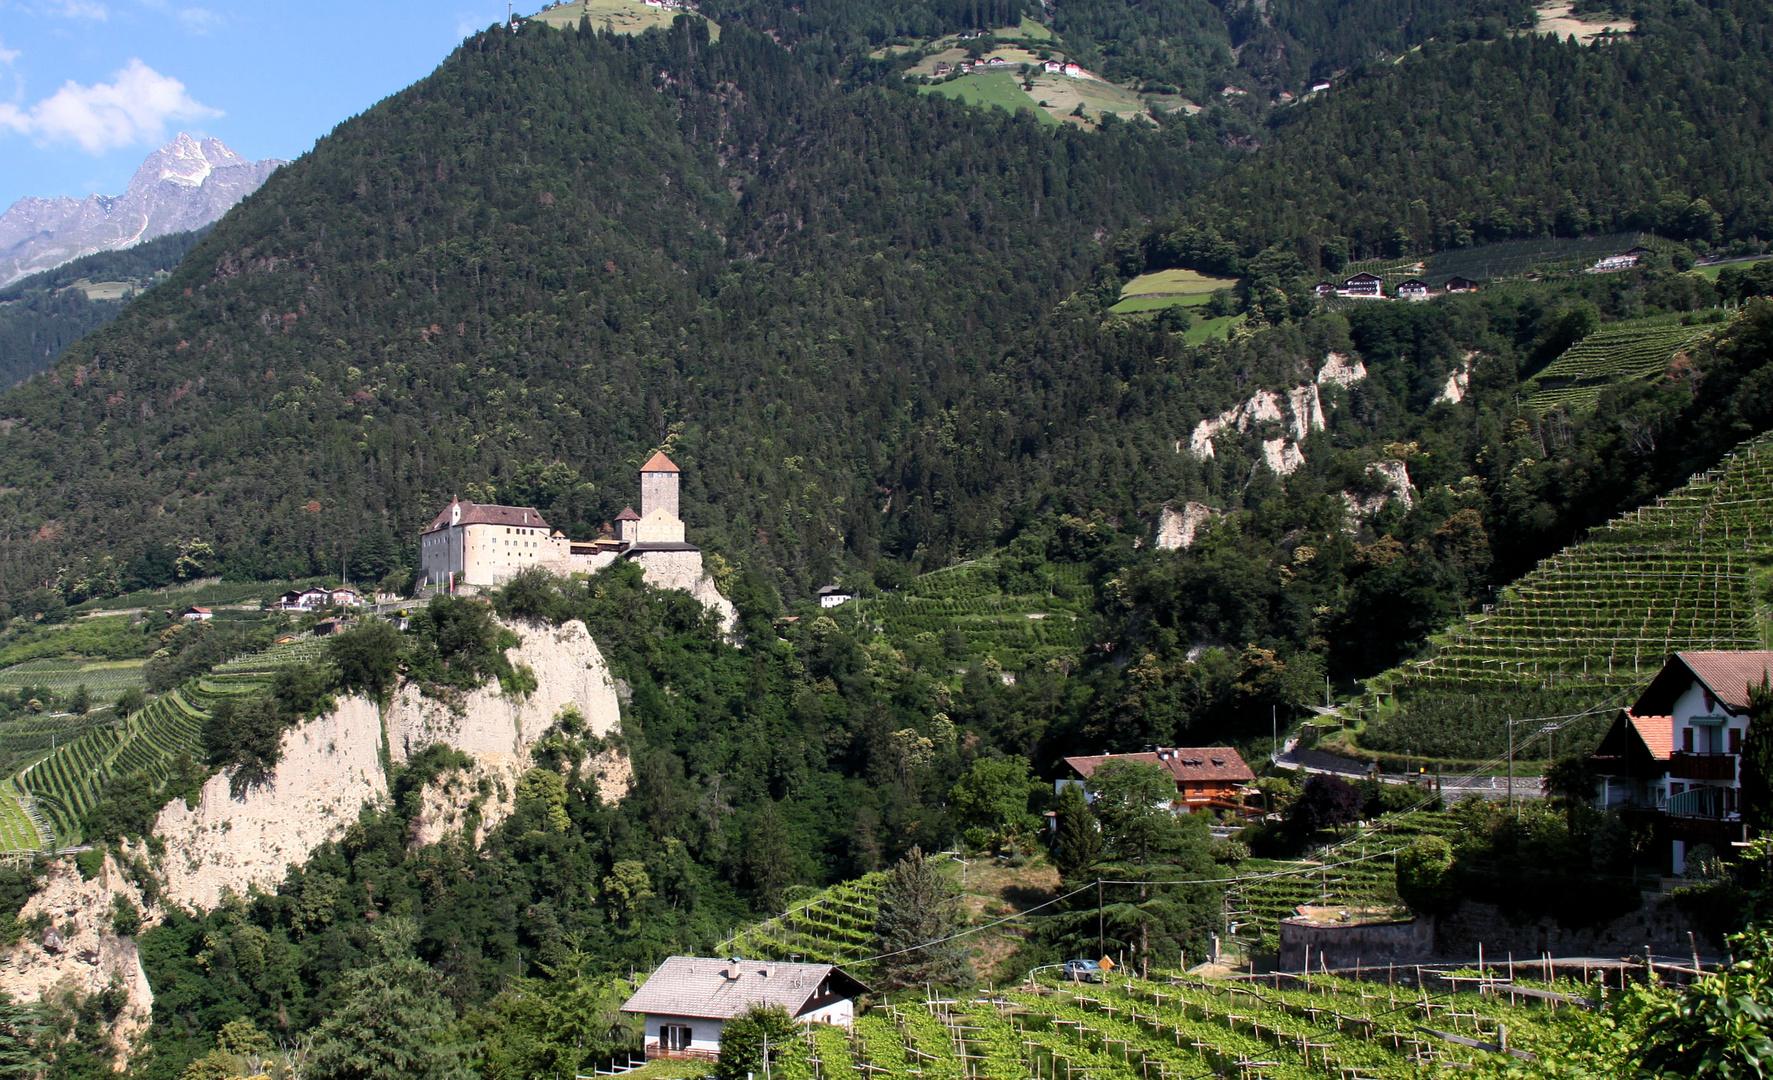 Le chateau Tyrol!